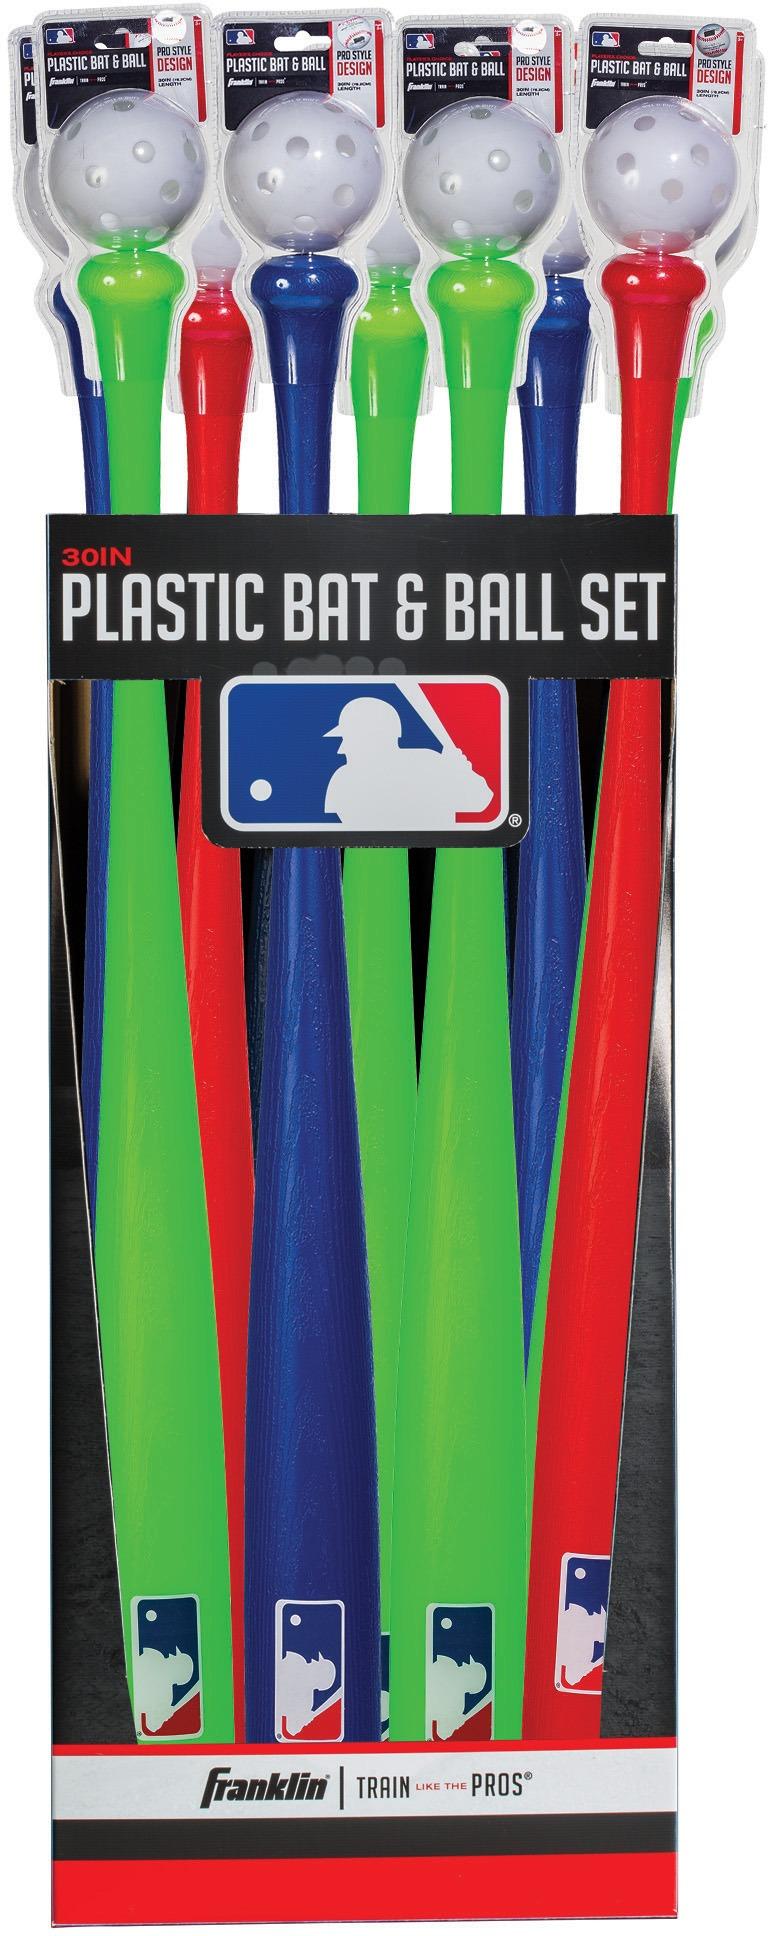 Franklin 64094 MLB Plastic Bat & Ball 12 pc Floor Display